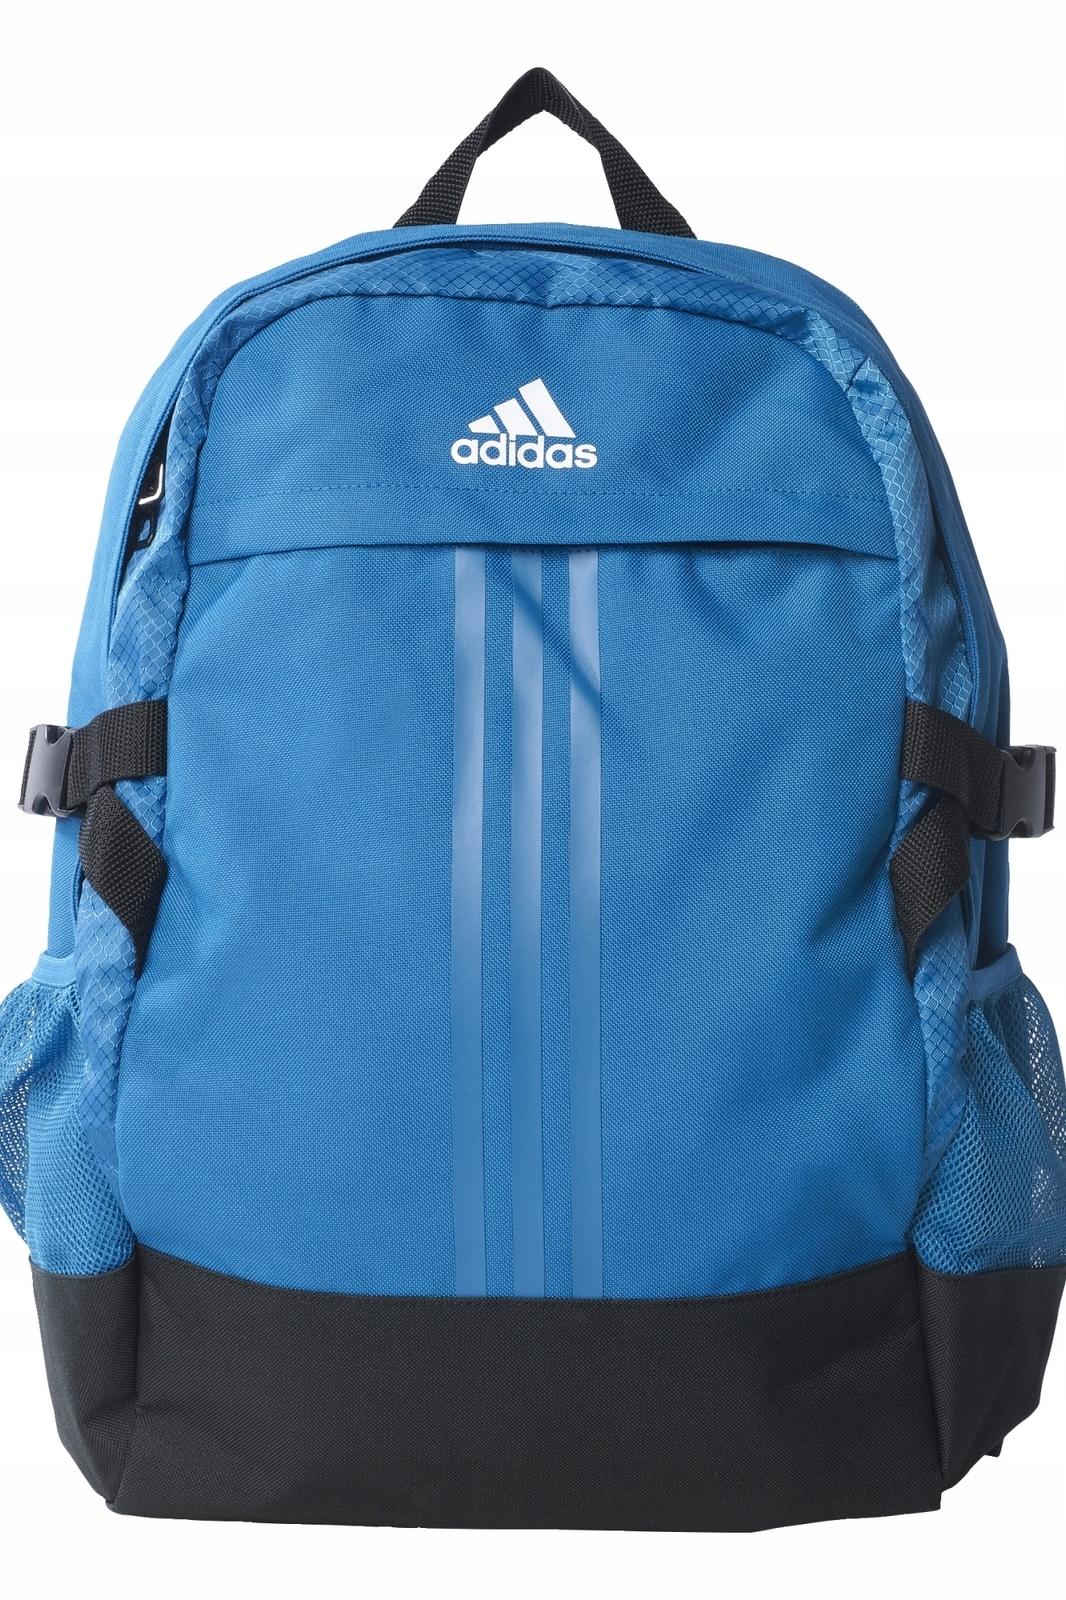 8cd756fa4d8a4 Plecak adidas BP POWER III M AY5091 - 7548311379 - oficjalne ...